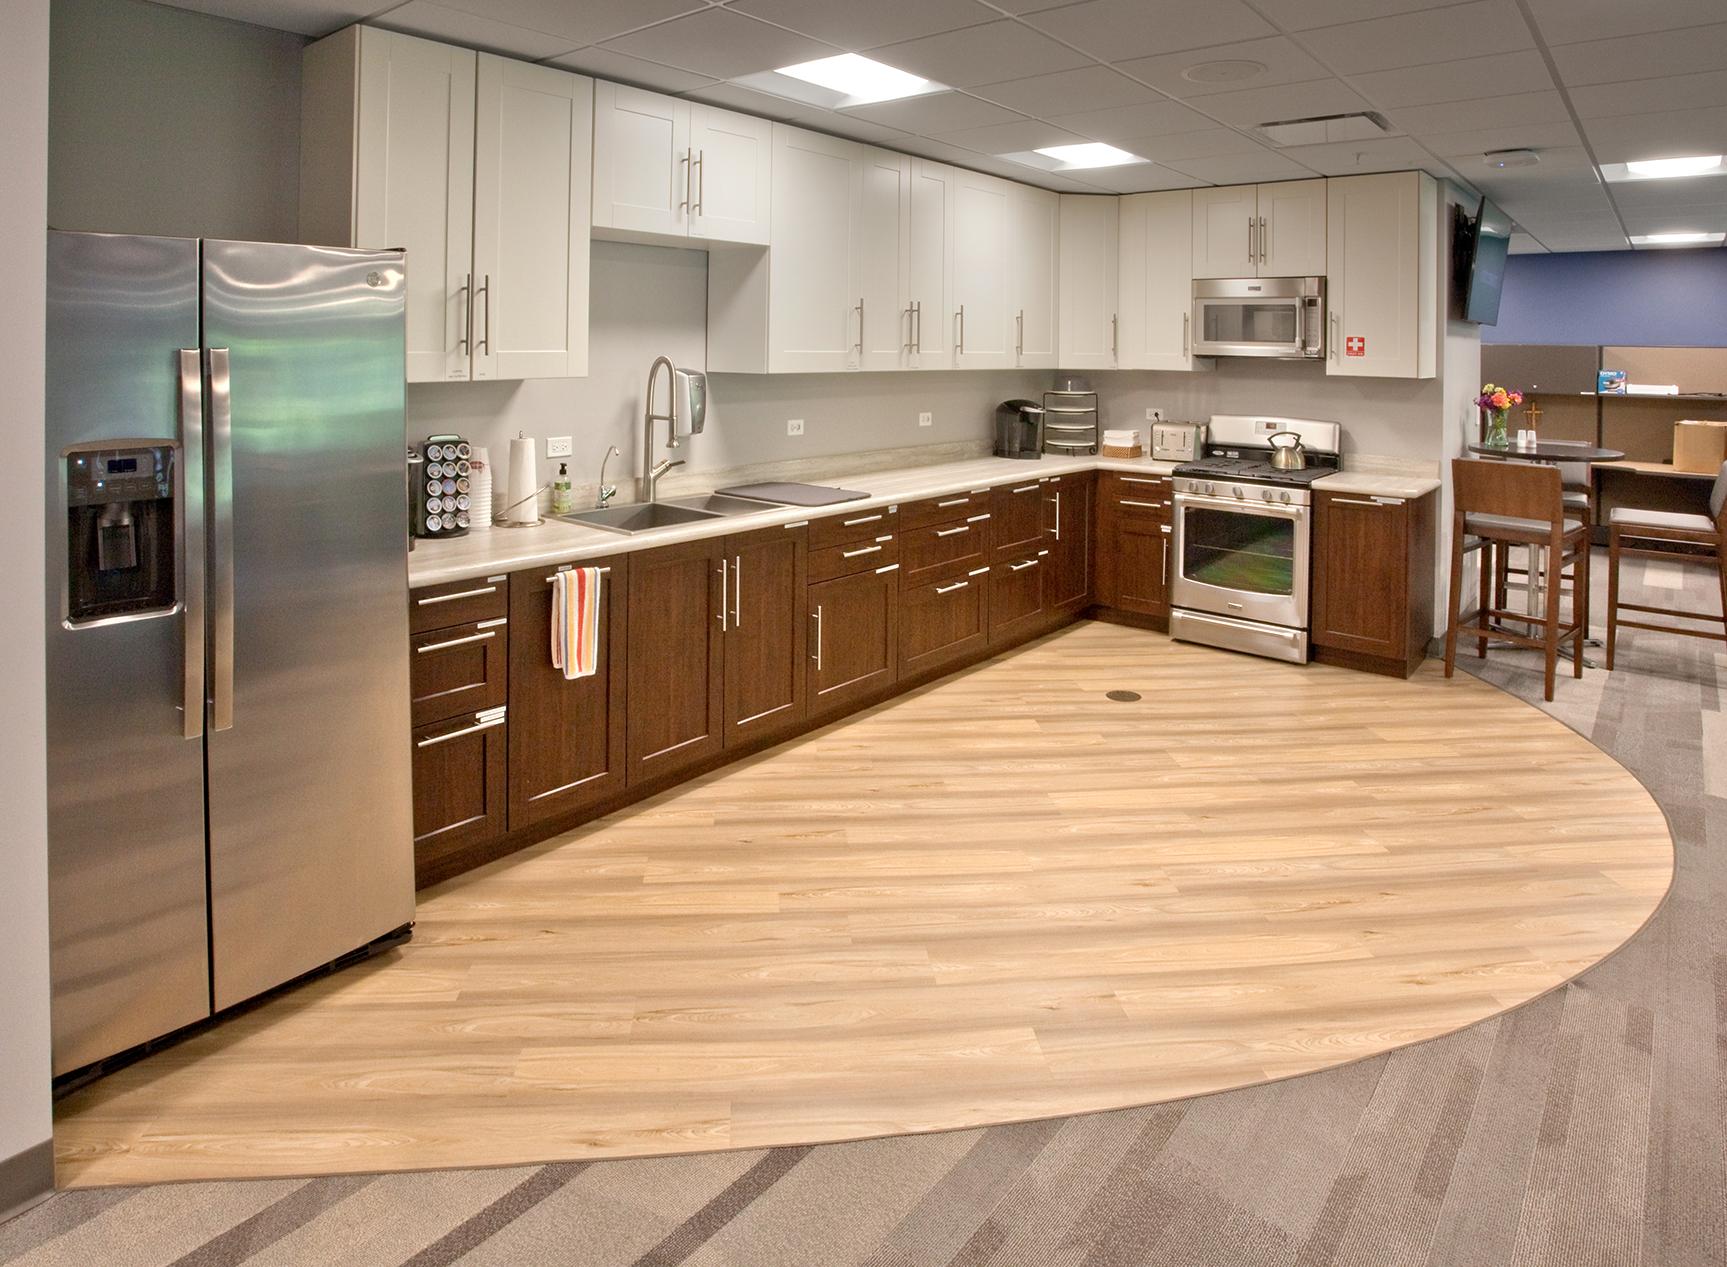 hickory-creek-church-kitchen